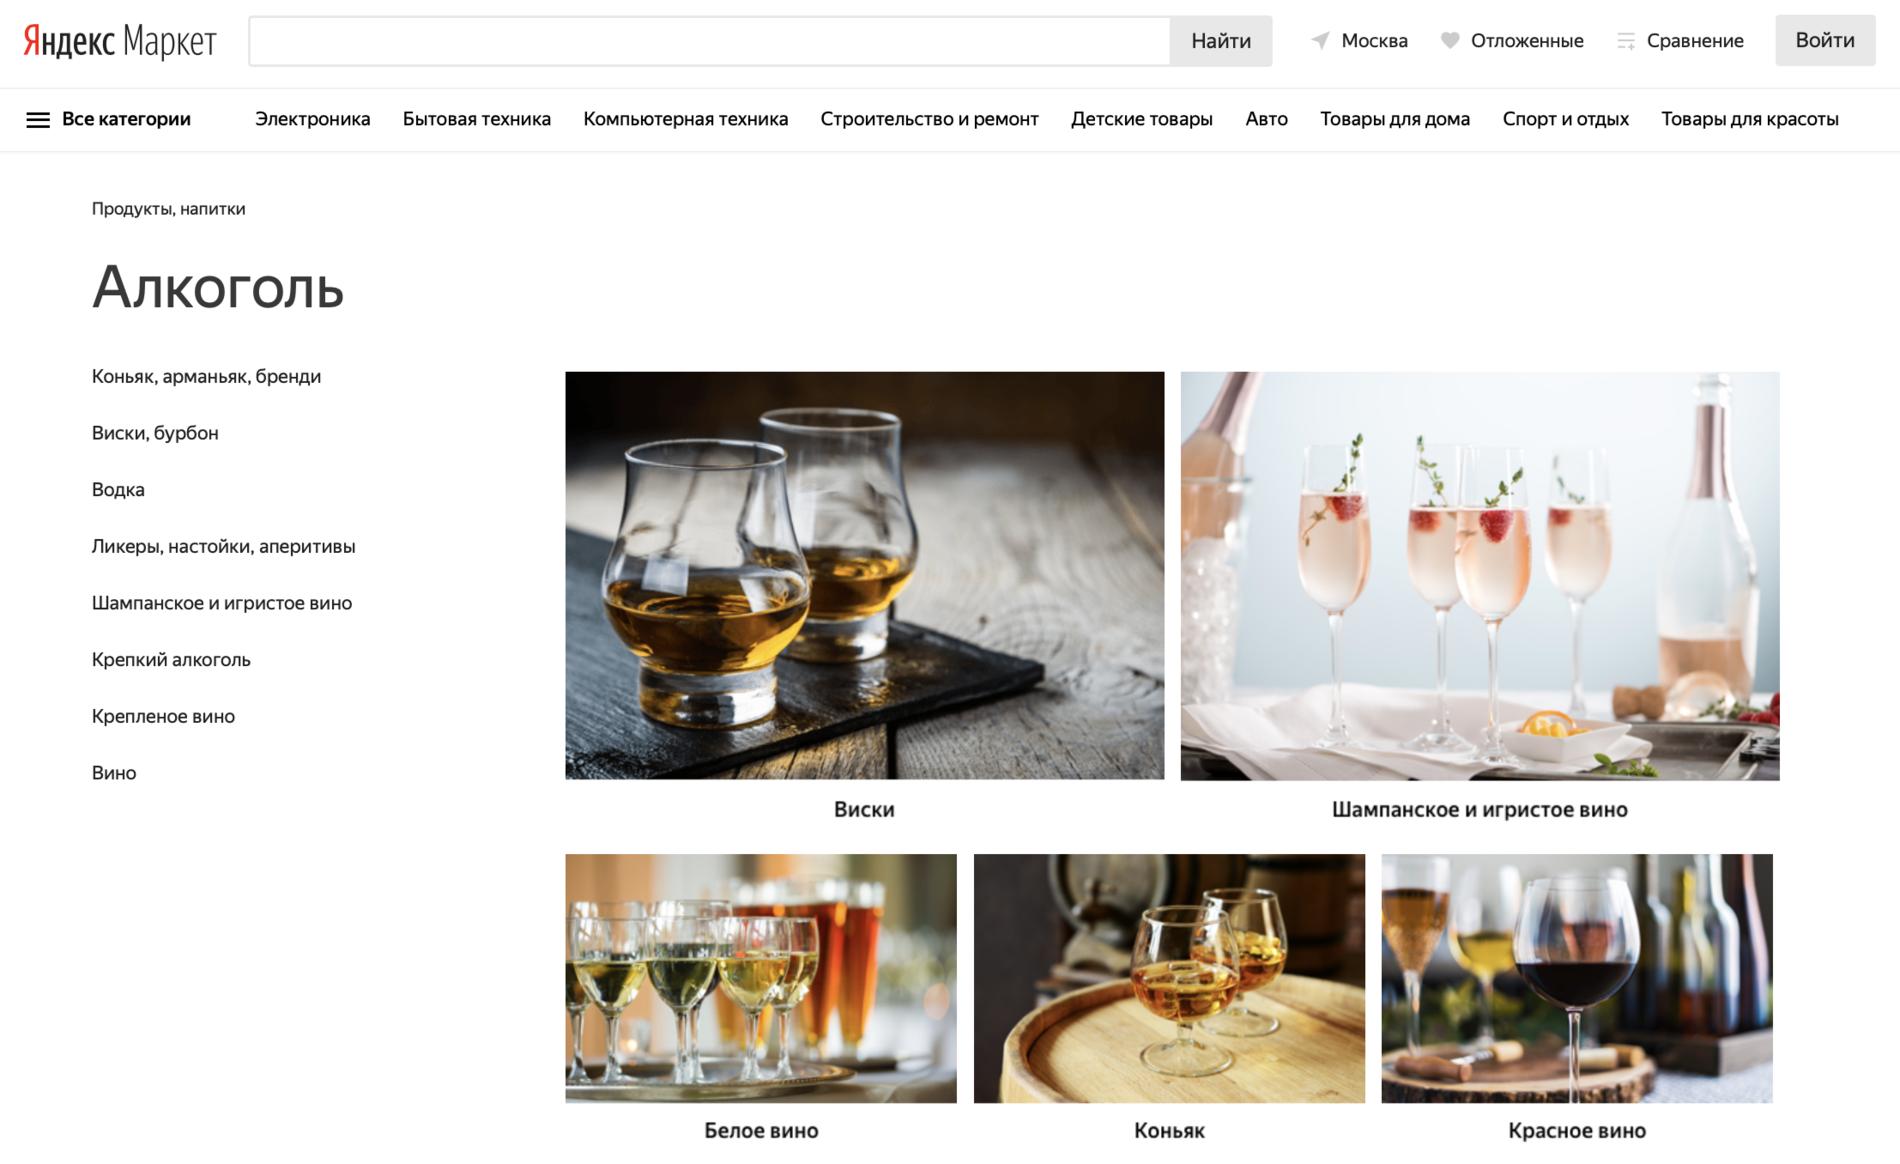 534d41f14e5 Каталог алкогольных напитков на «Яндекс.Маркете» — The Village